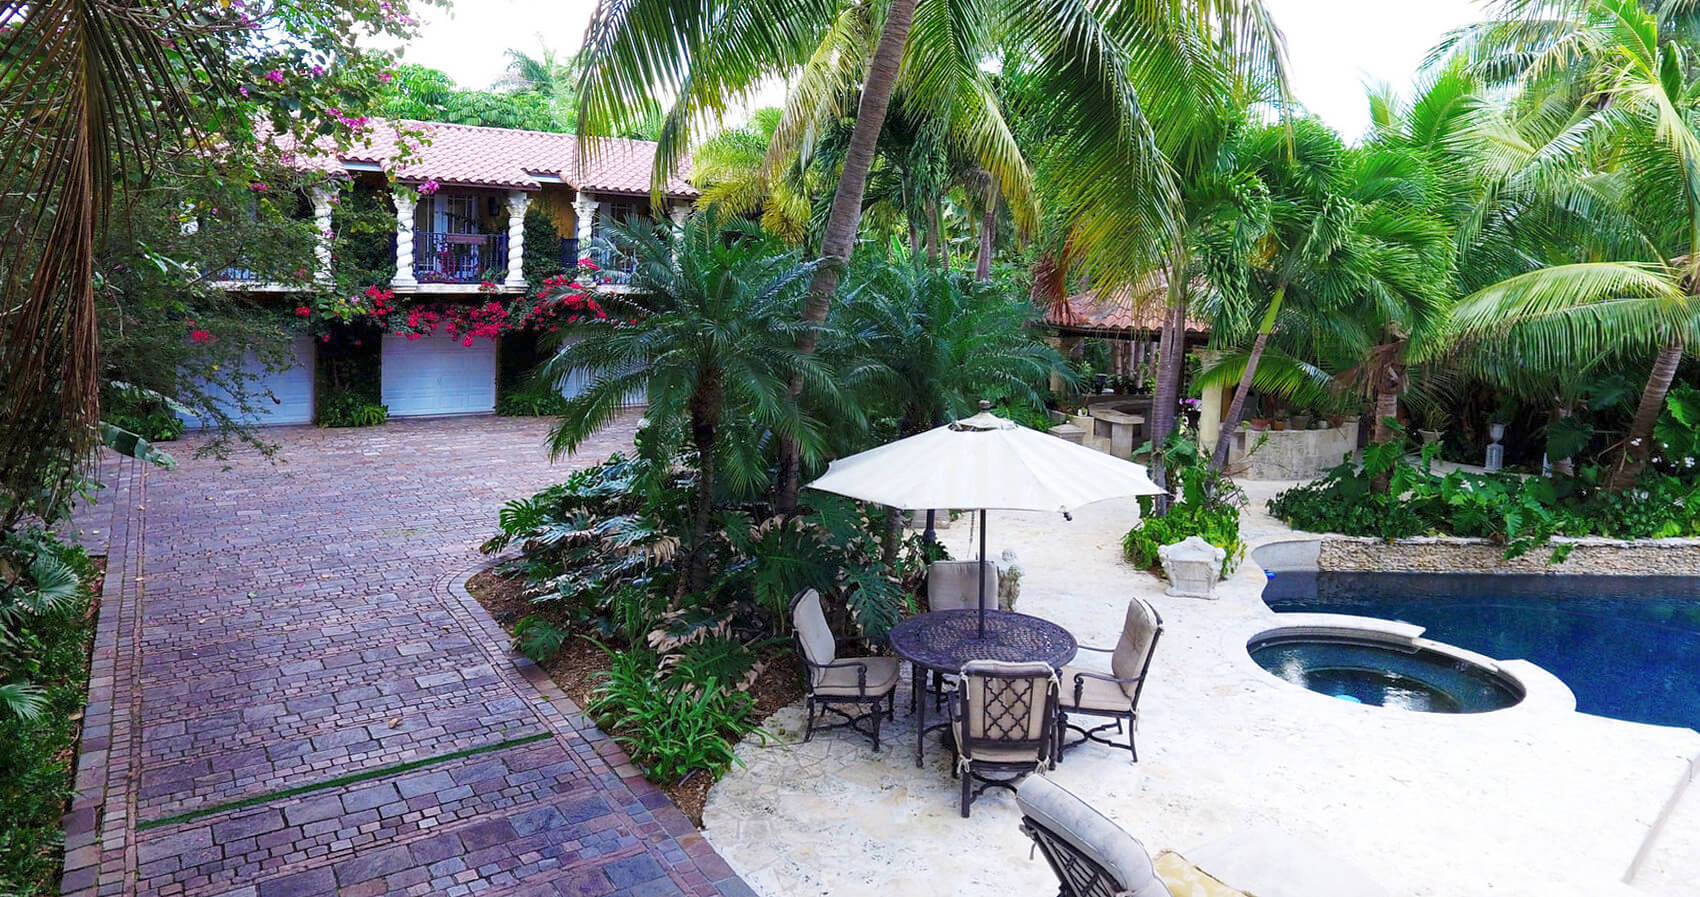 15__coconut_grove_aerial_photo_by_MiamiRealEstatePhotographers.com